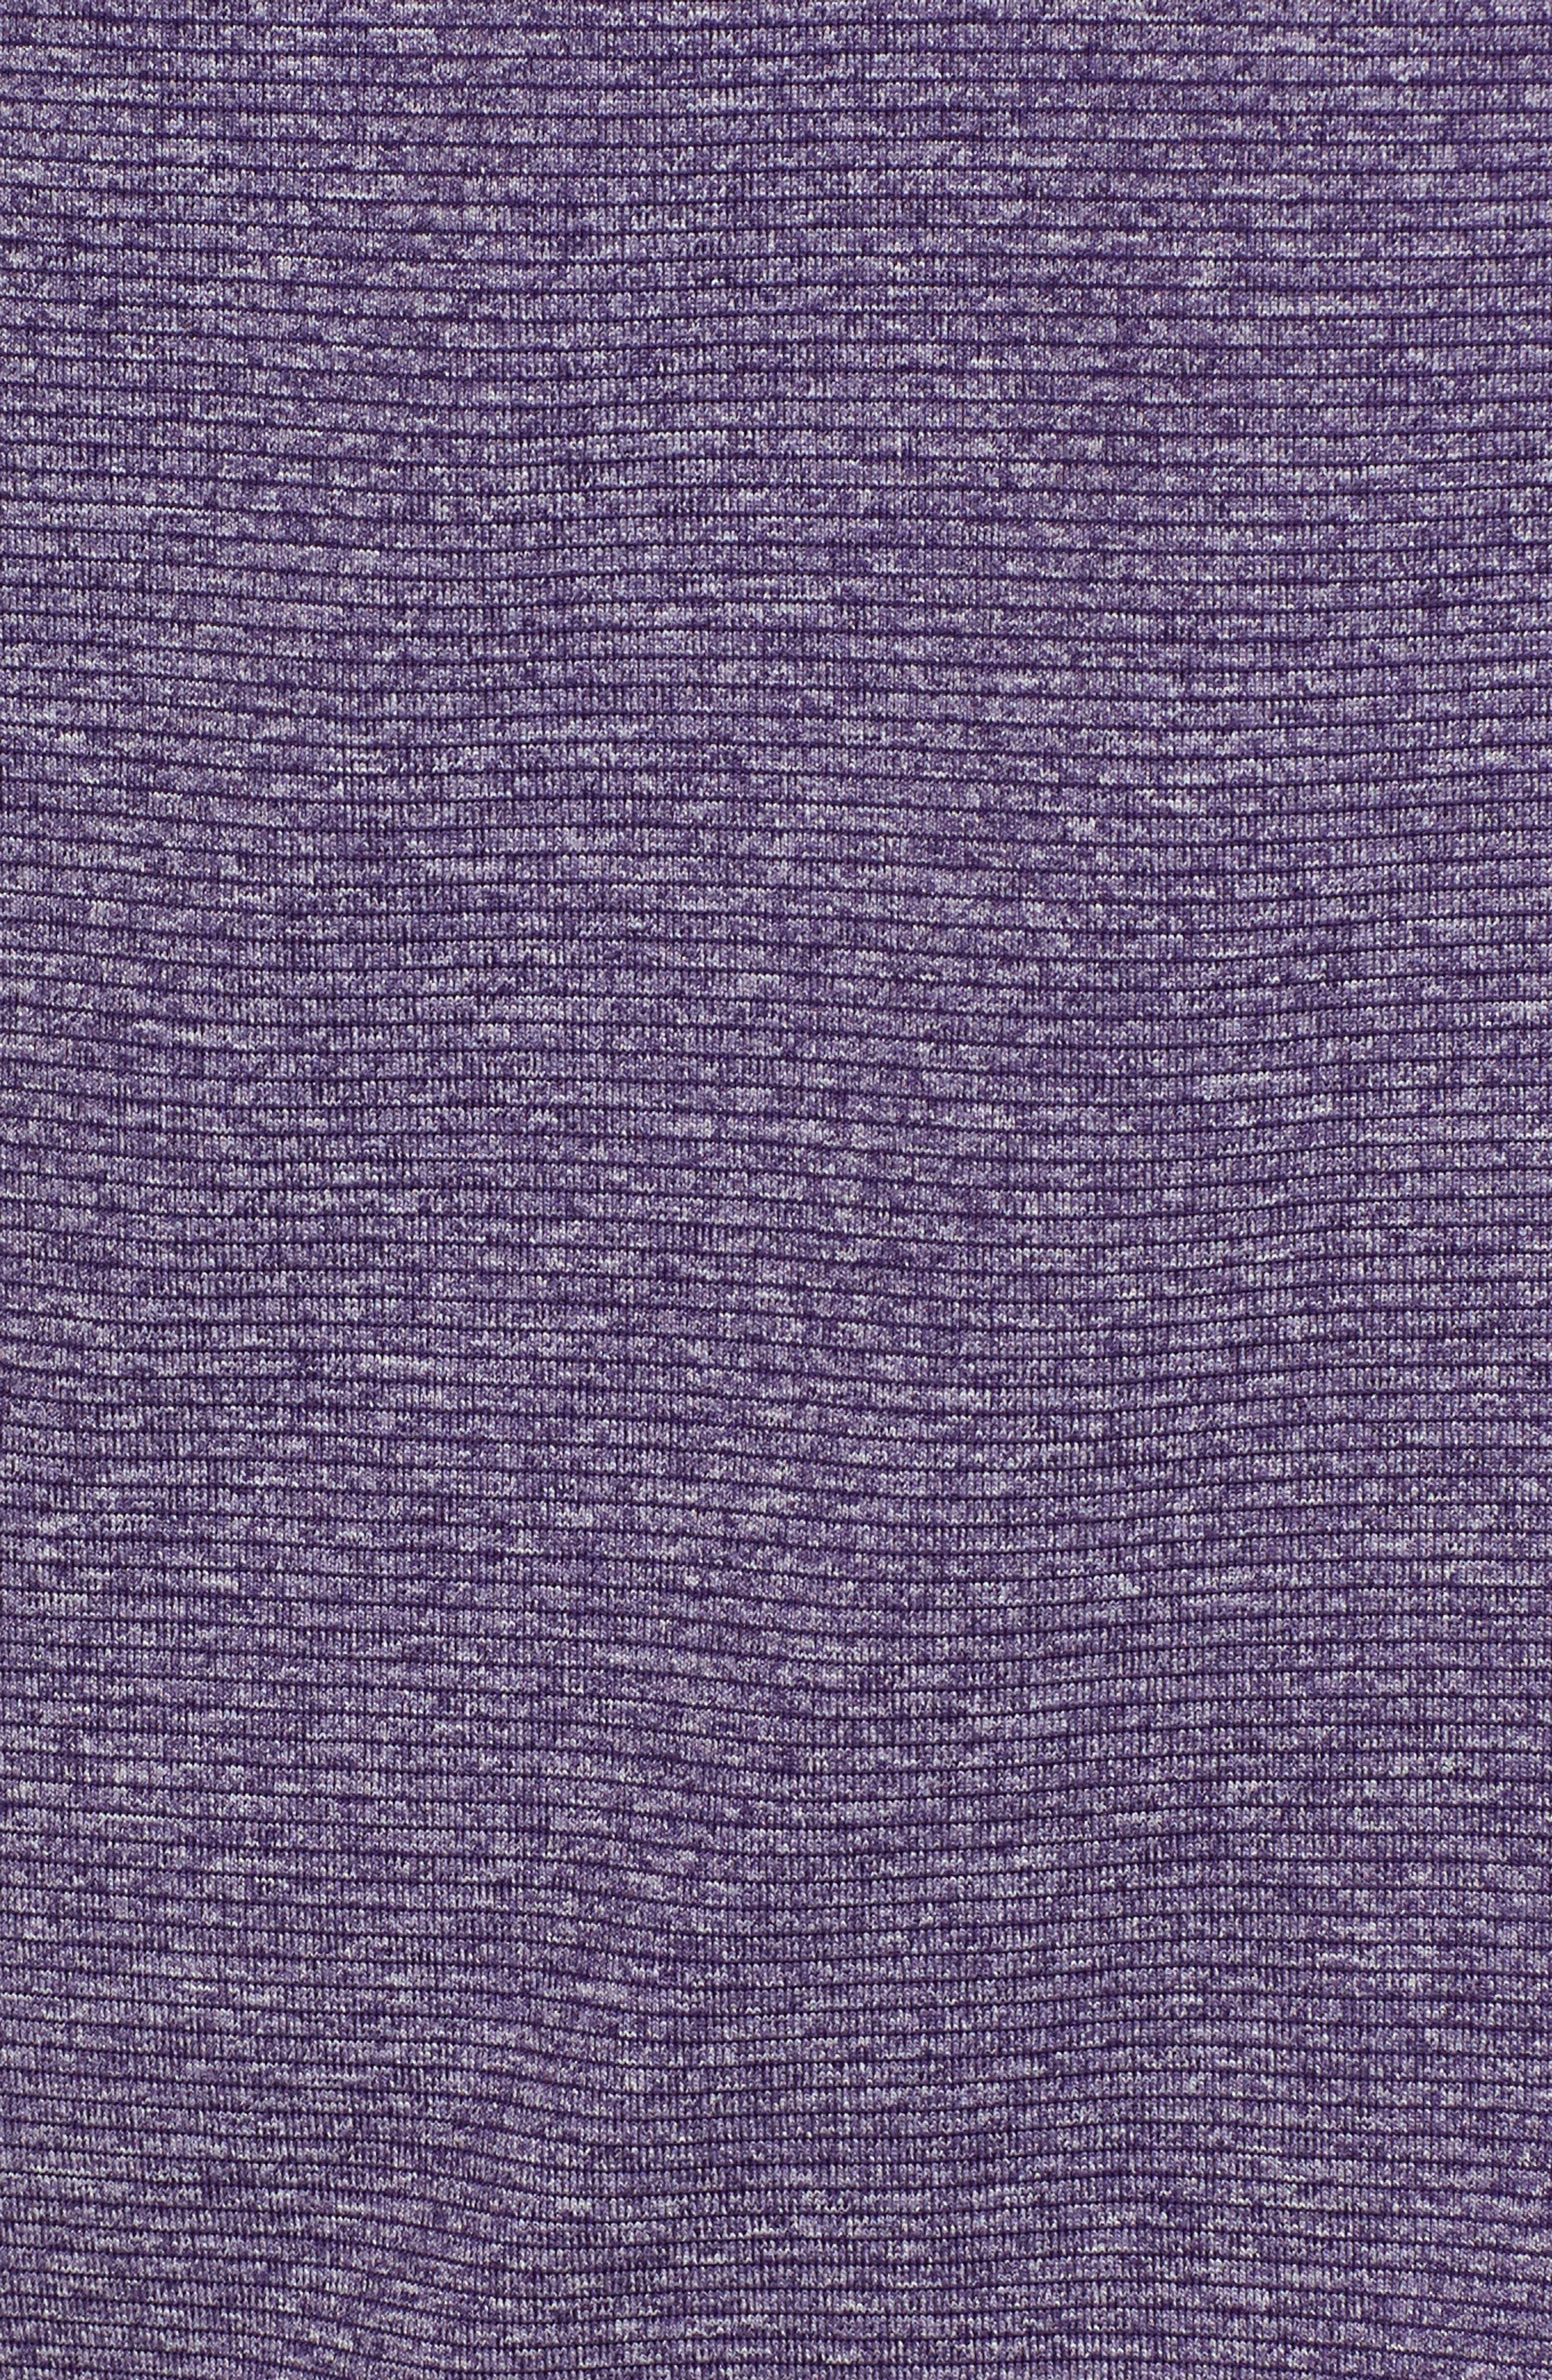 Shoreline - Minnesota Vikings Half Zip Pullover,                             Alternate thumbnail 5, color,                             513